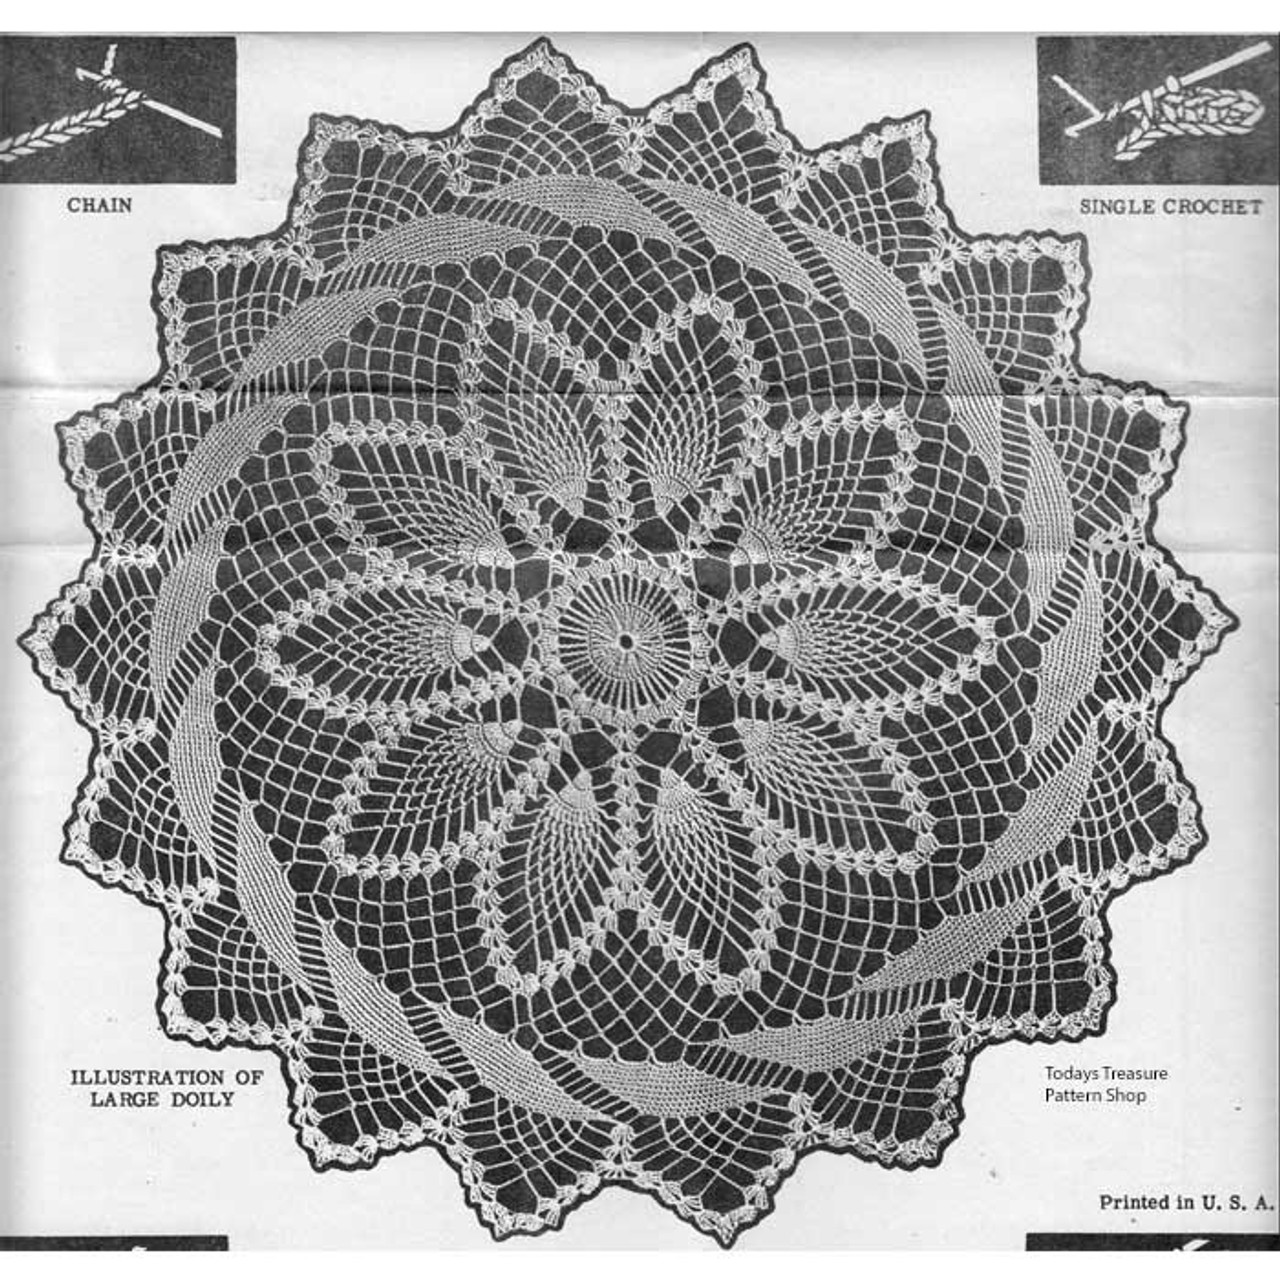 Crochet Pineapple Flower Doily pattern with ring border